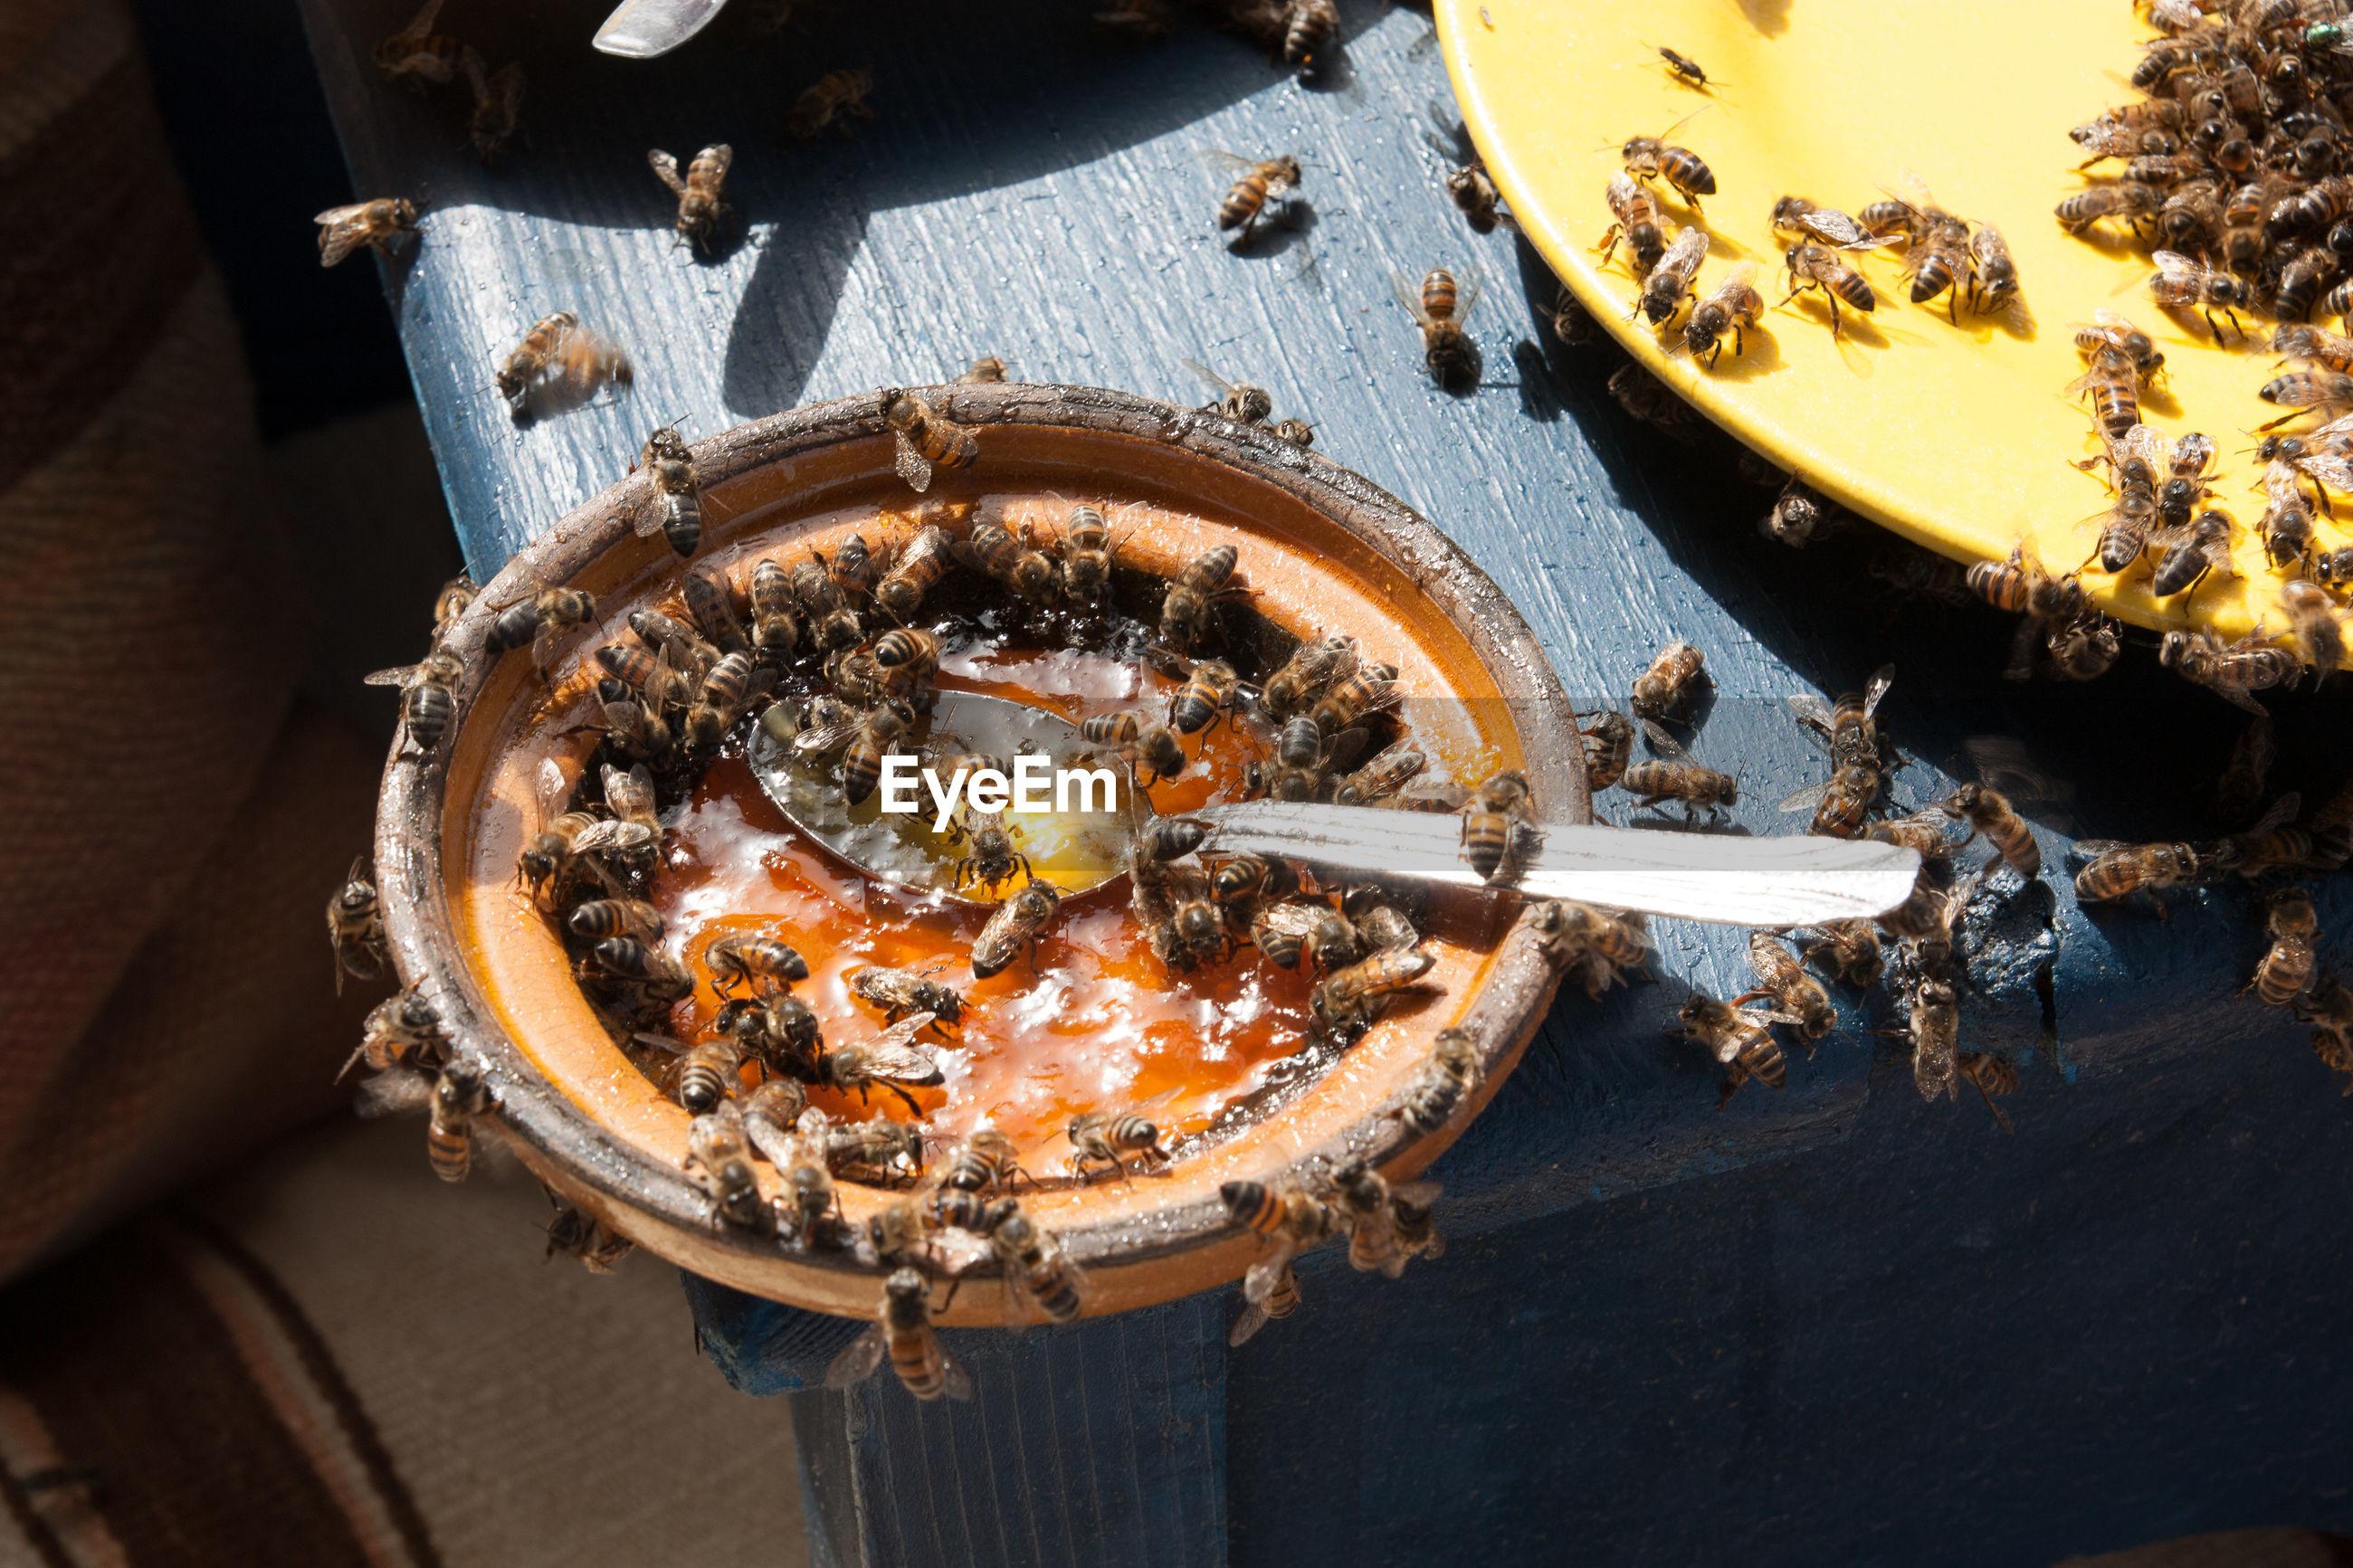 Honeybees in a bowl of honey